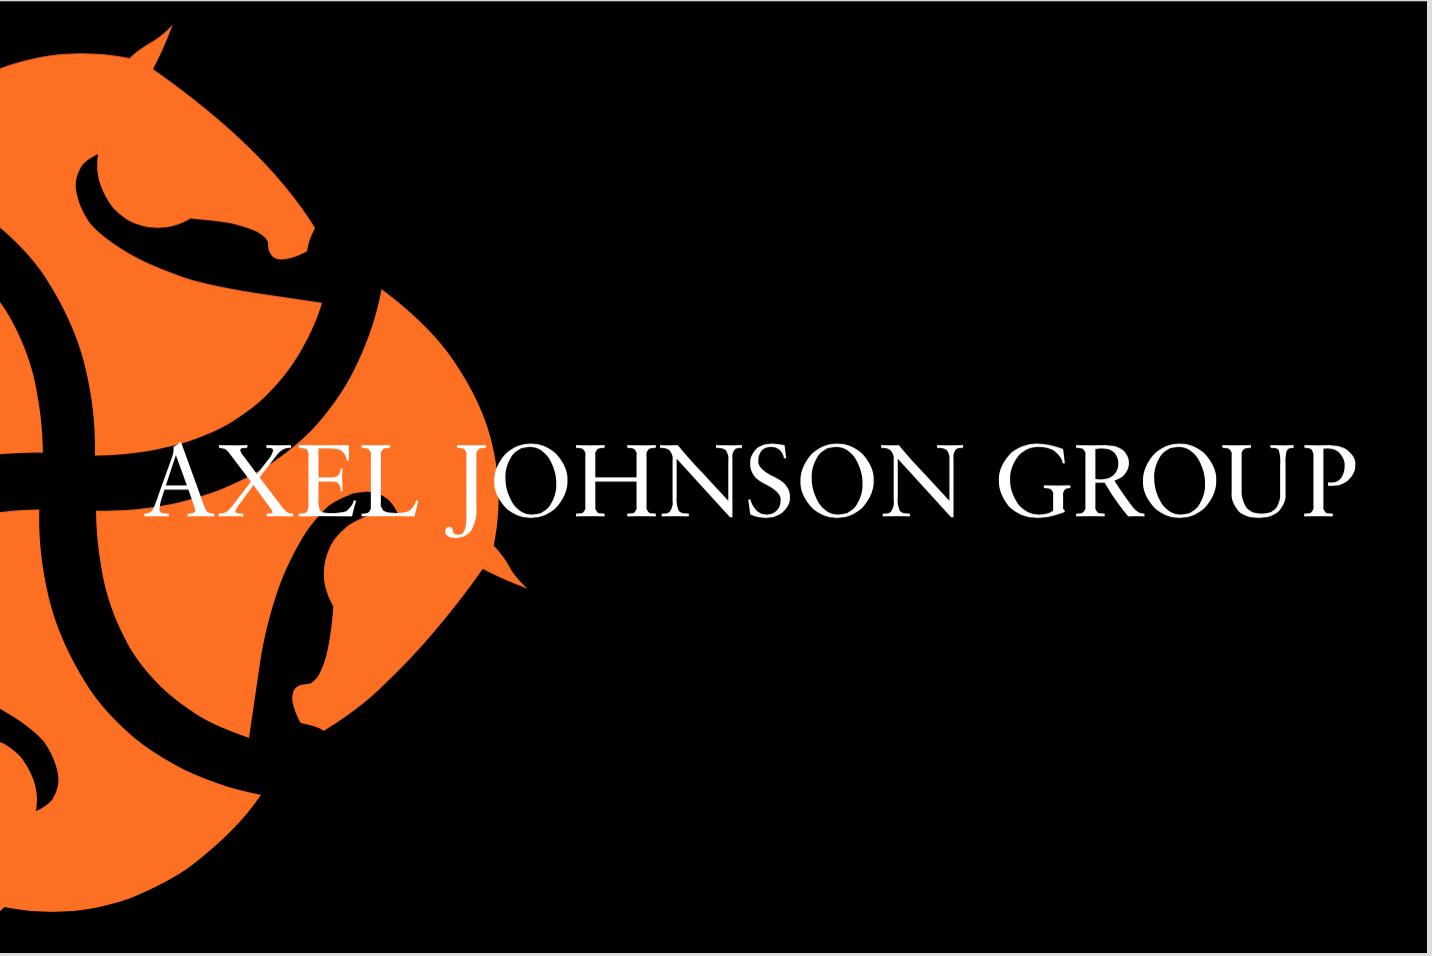 Axel Johnson Group